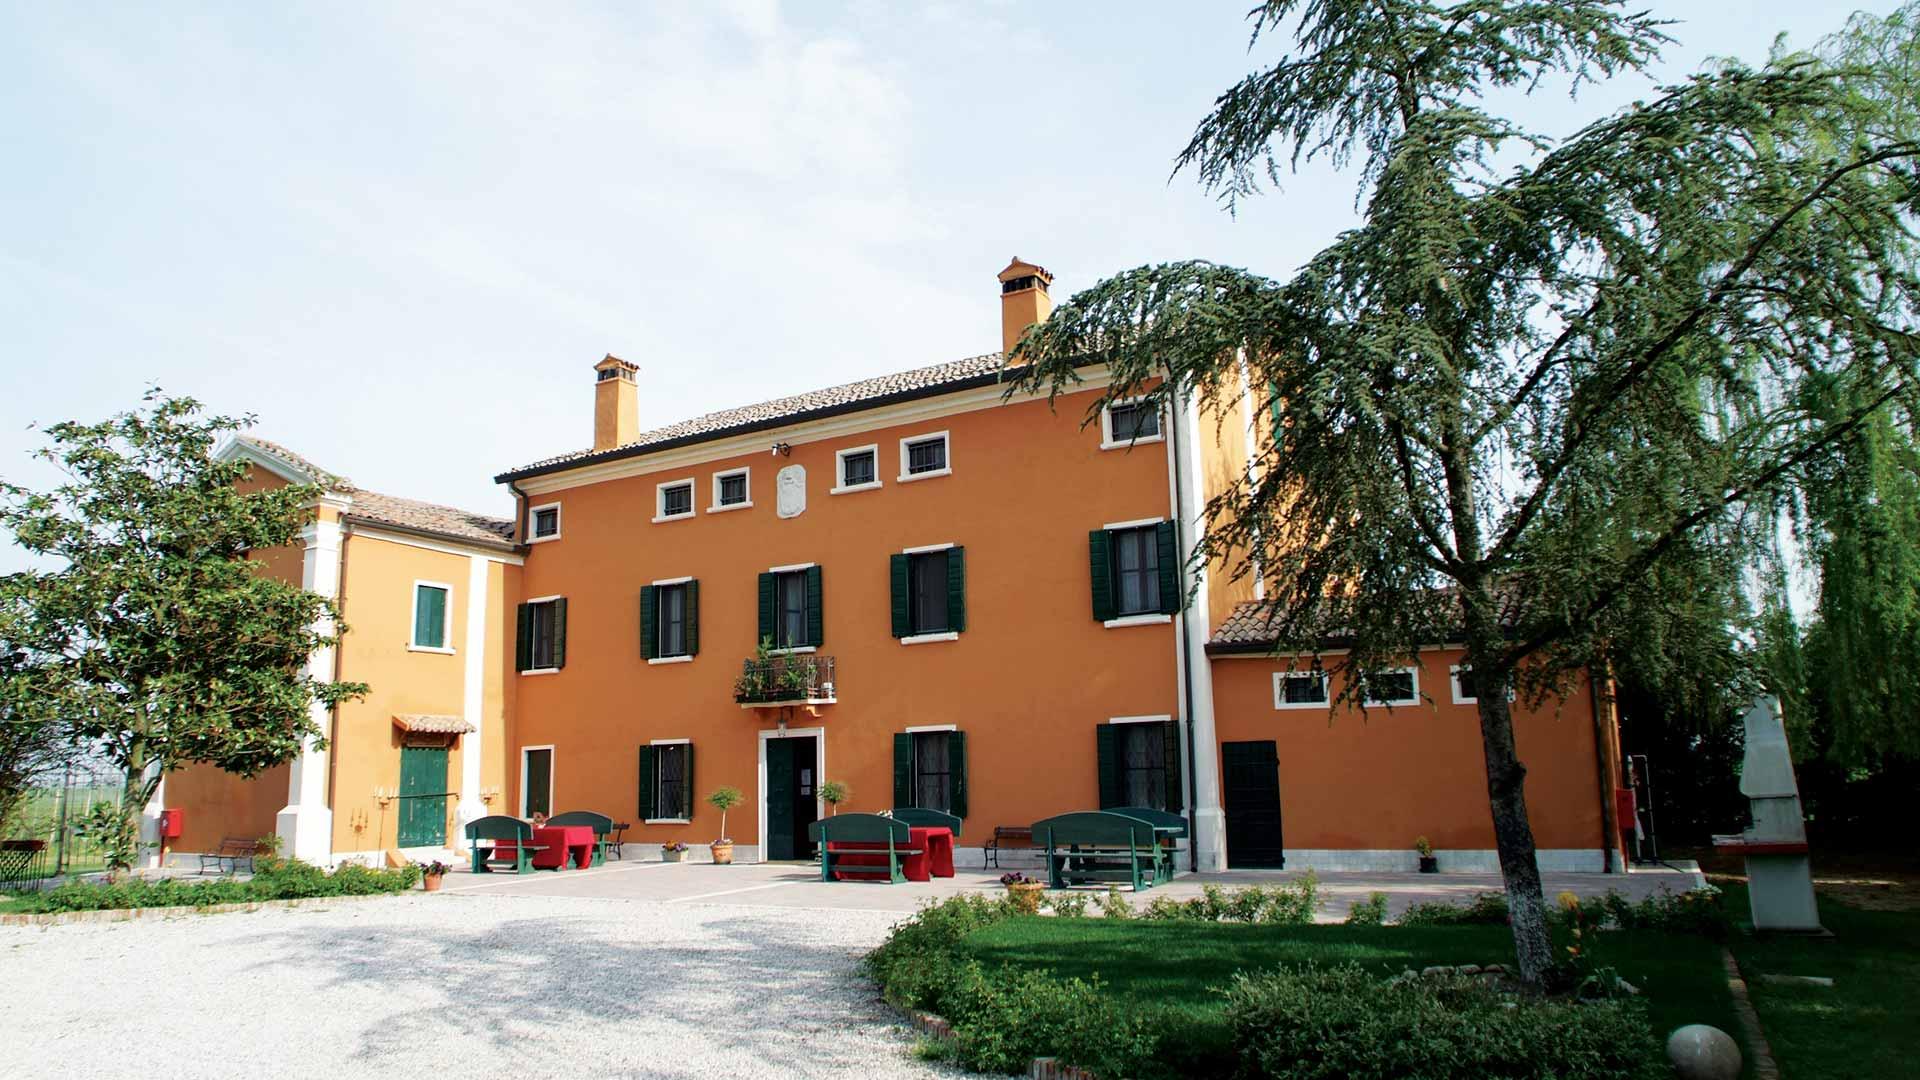 Tenuta Goro Veneto